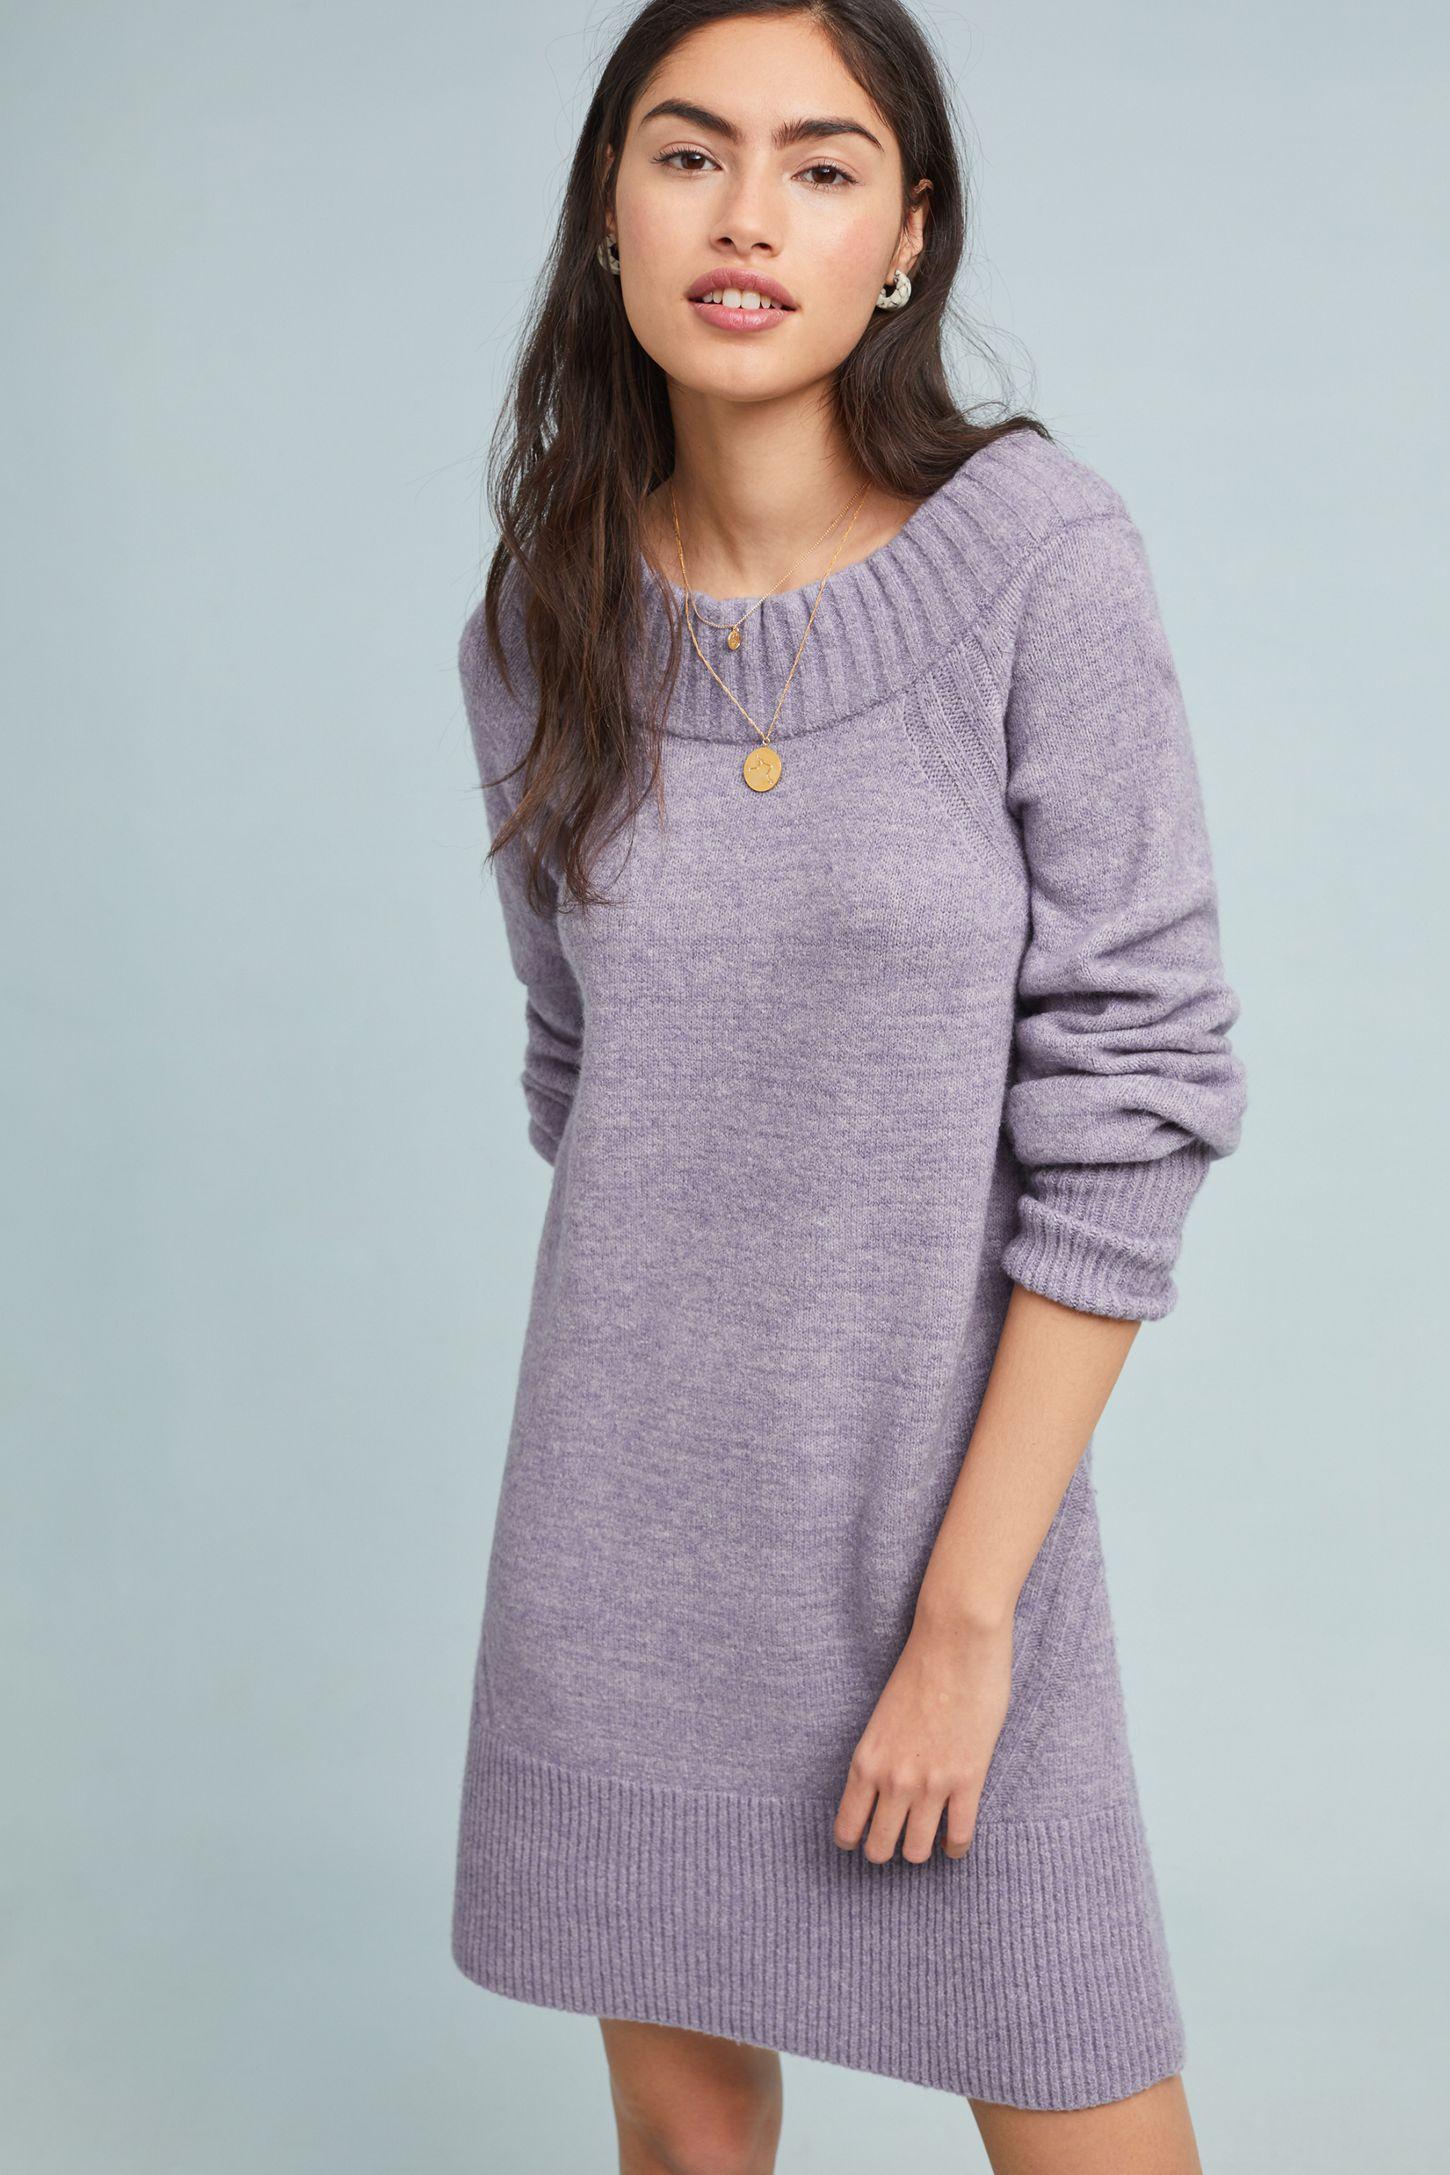 ac8147dee74 Rhyme Sweater Dress